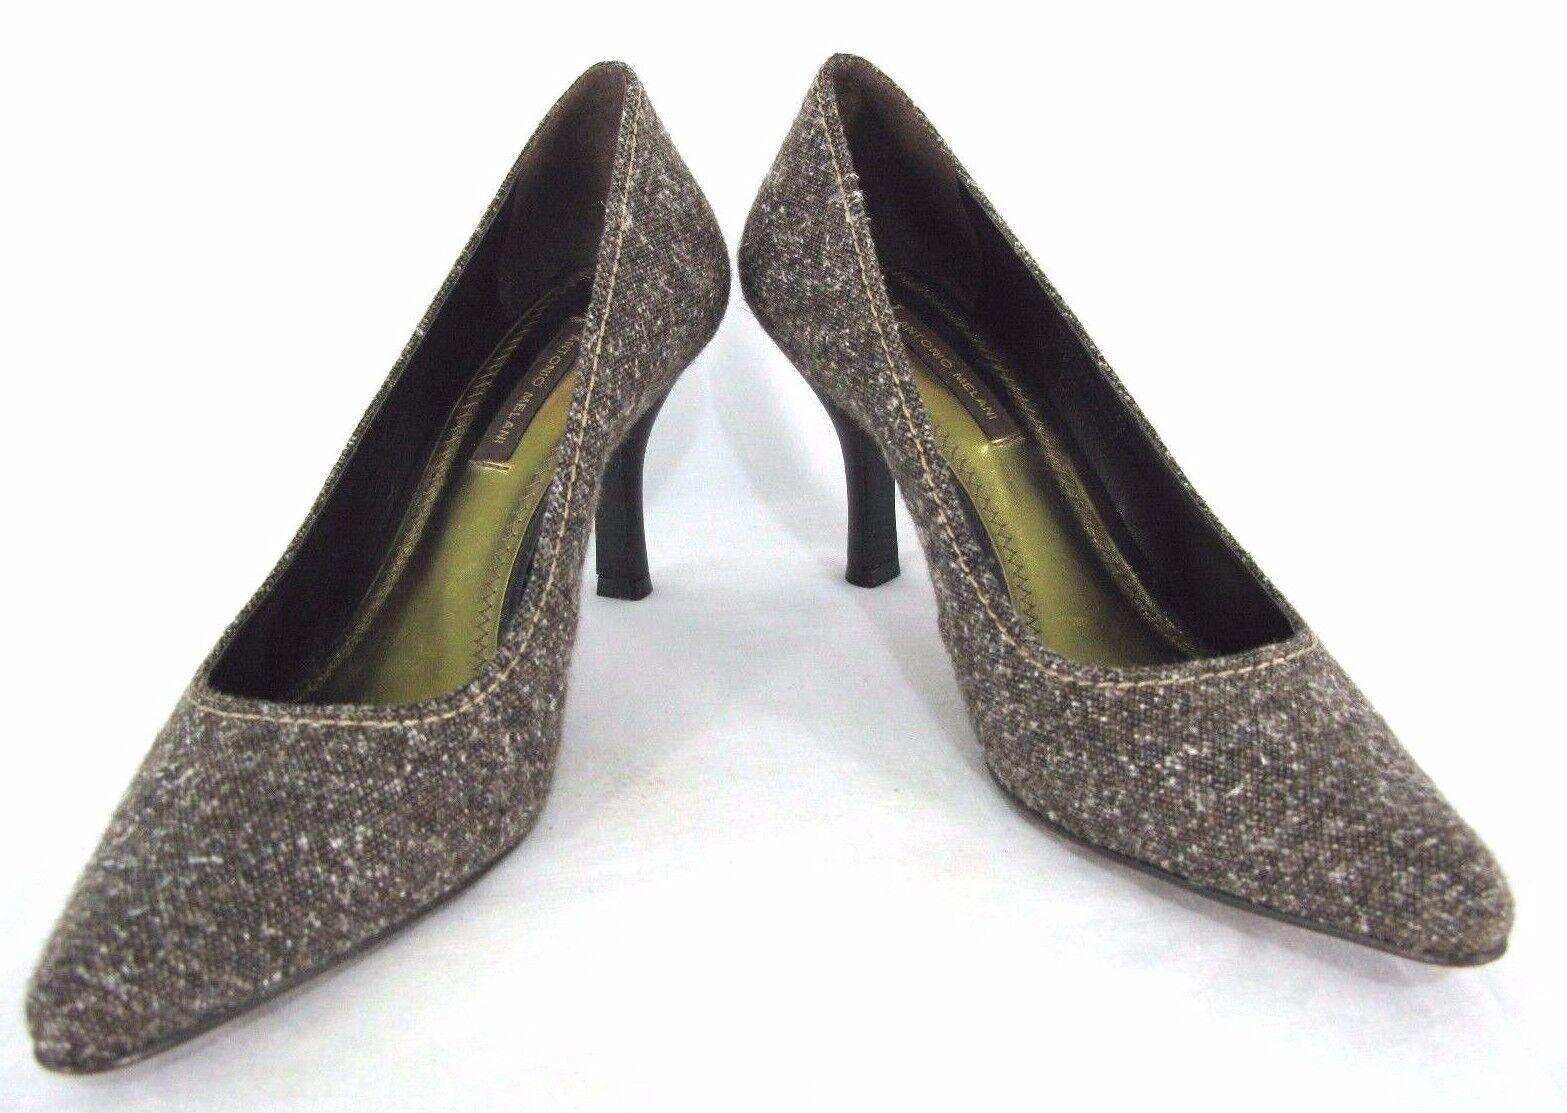 Antonio Melani Shoes 7M Pumps Brown Fleck